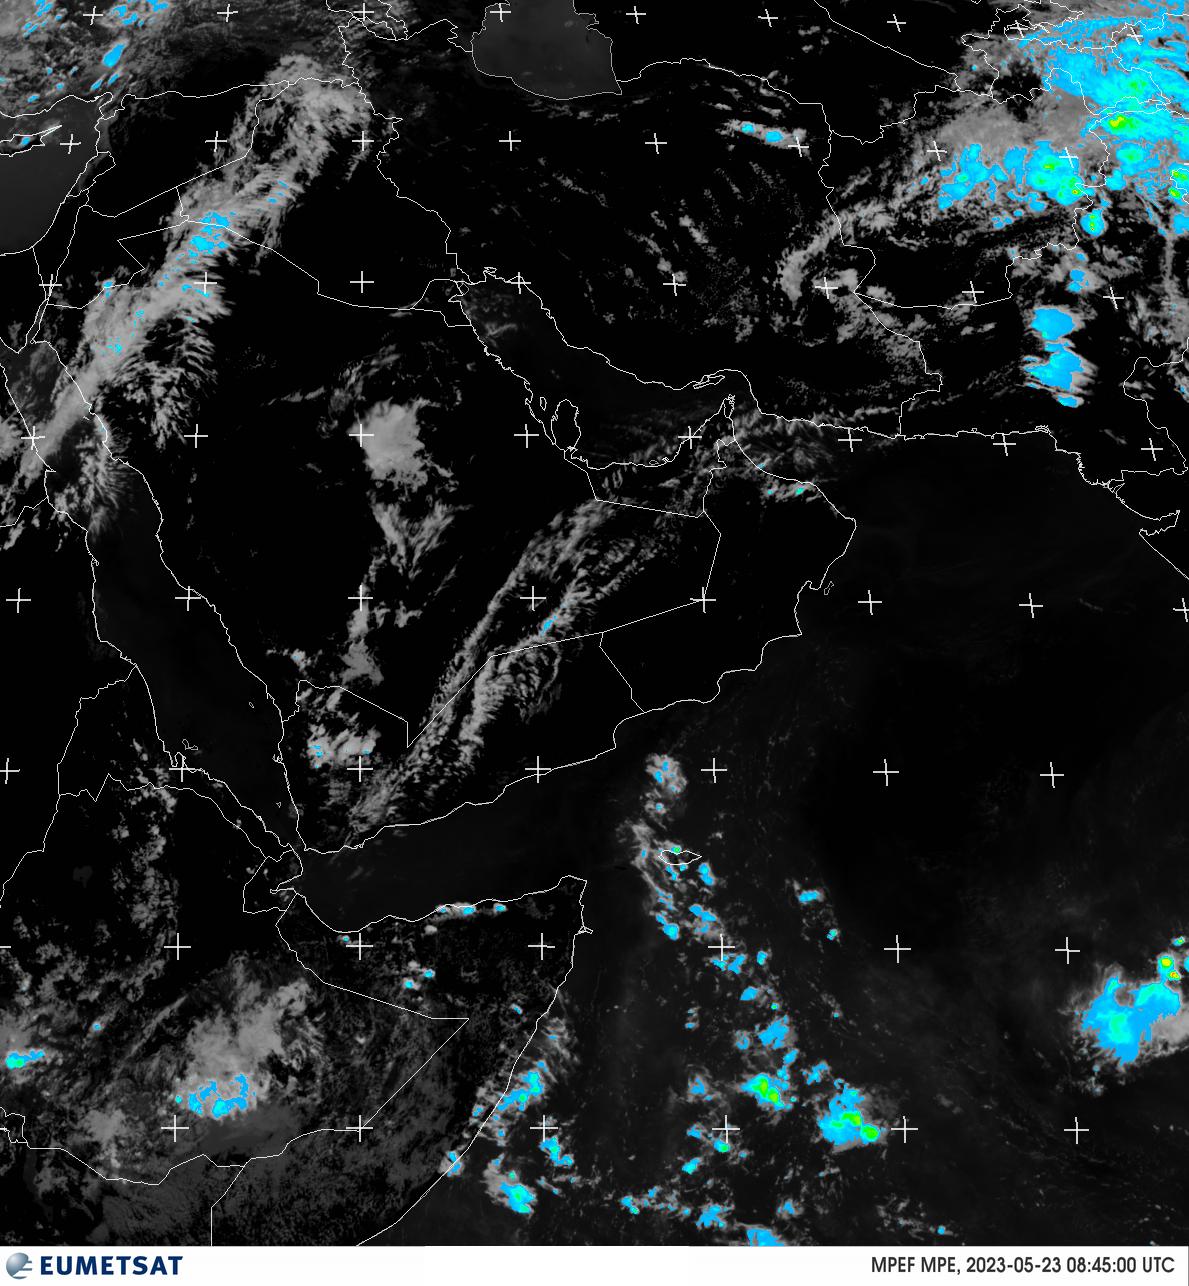 آخرین تصویر پوشش ابر و مناطق مستعد بارش